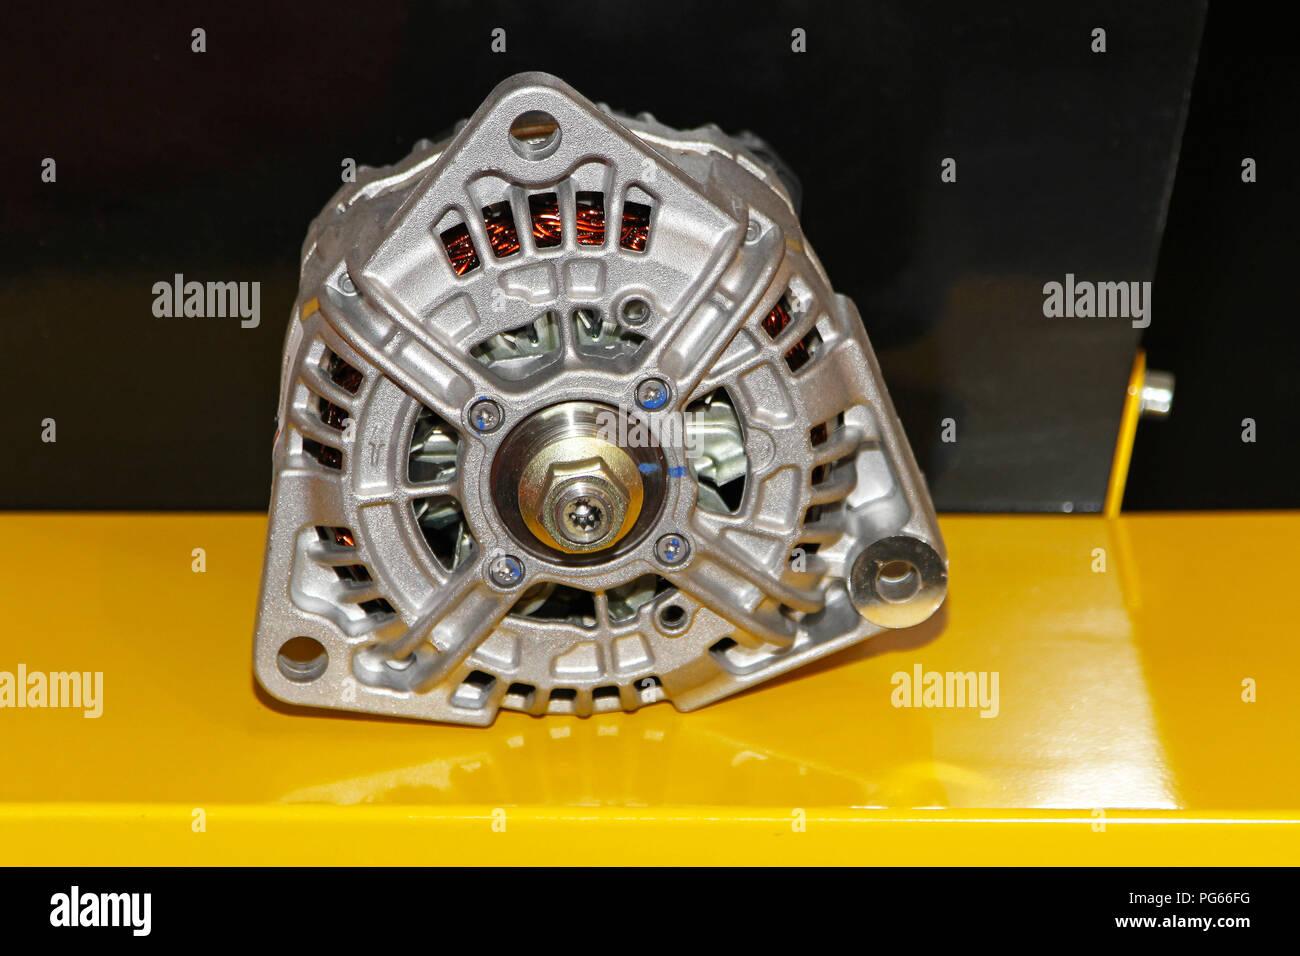 Close Up Shot Of Car Alternator Generator Stock Photo Alamy